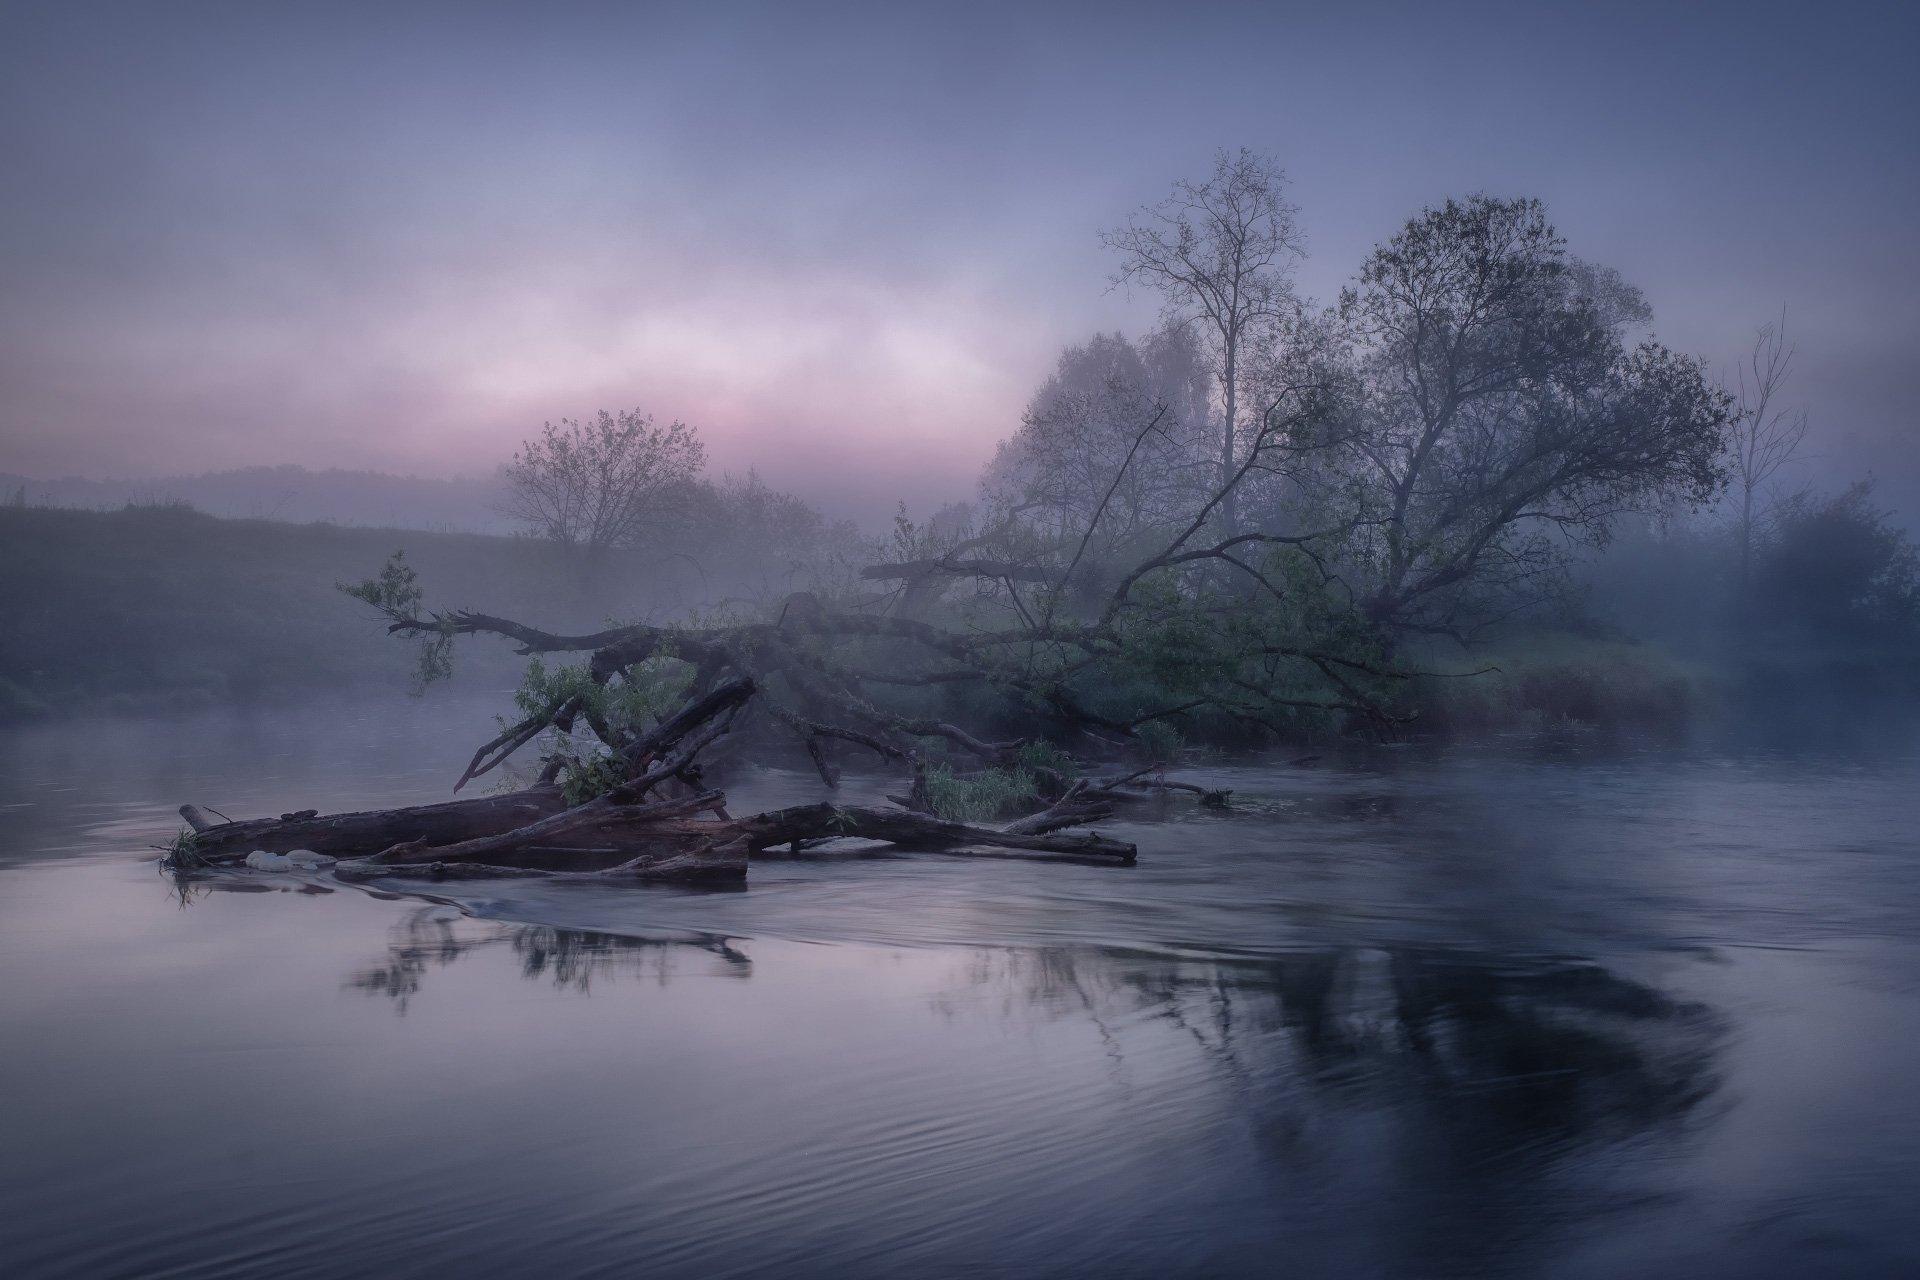 истра, река, утро, рассвет, бурелом, туман, заря, Андрей Чиж